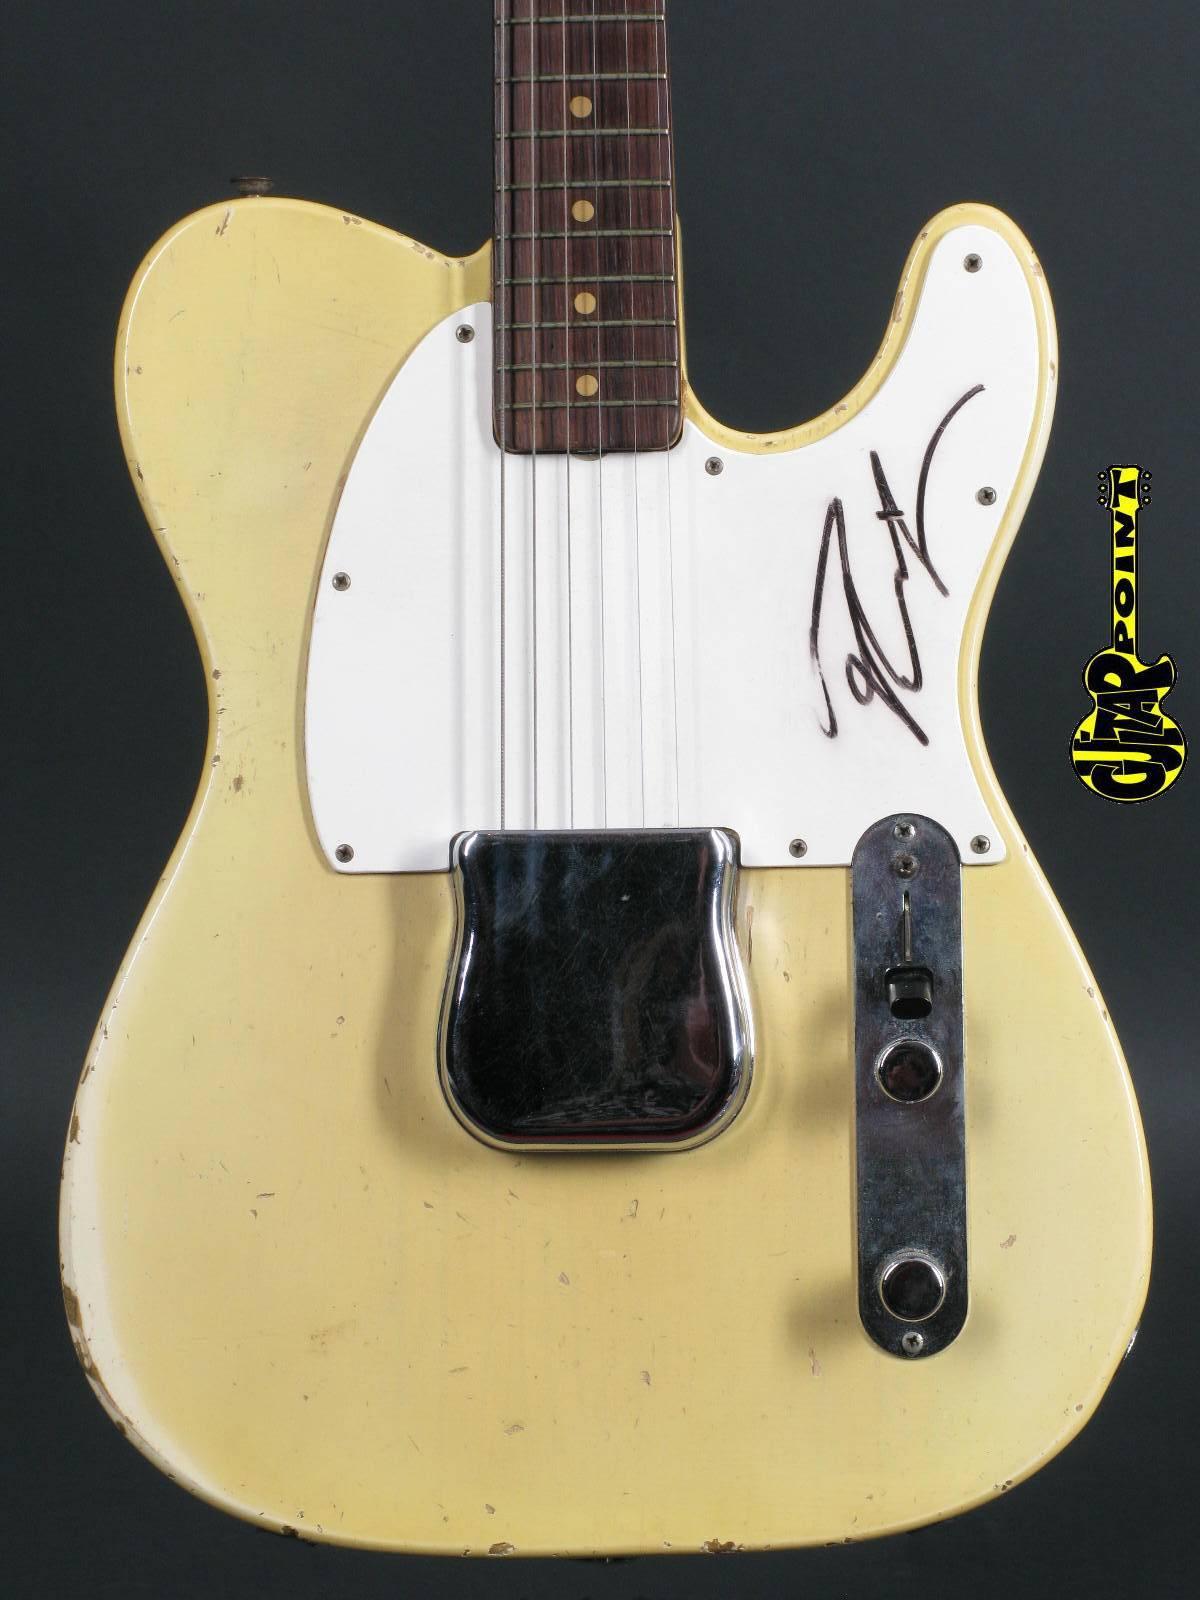 1963 Fender Esquire - Blond (Telecaster)